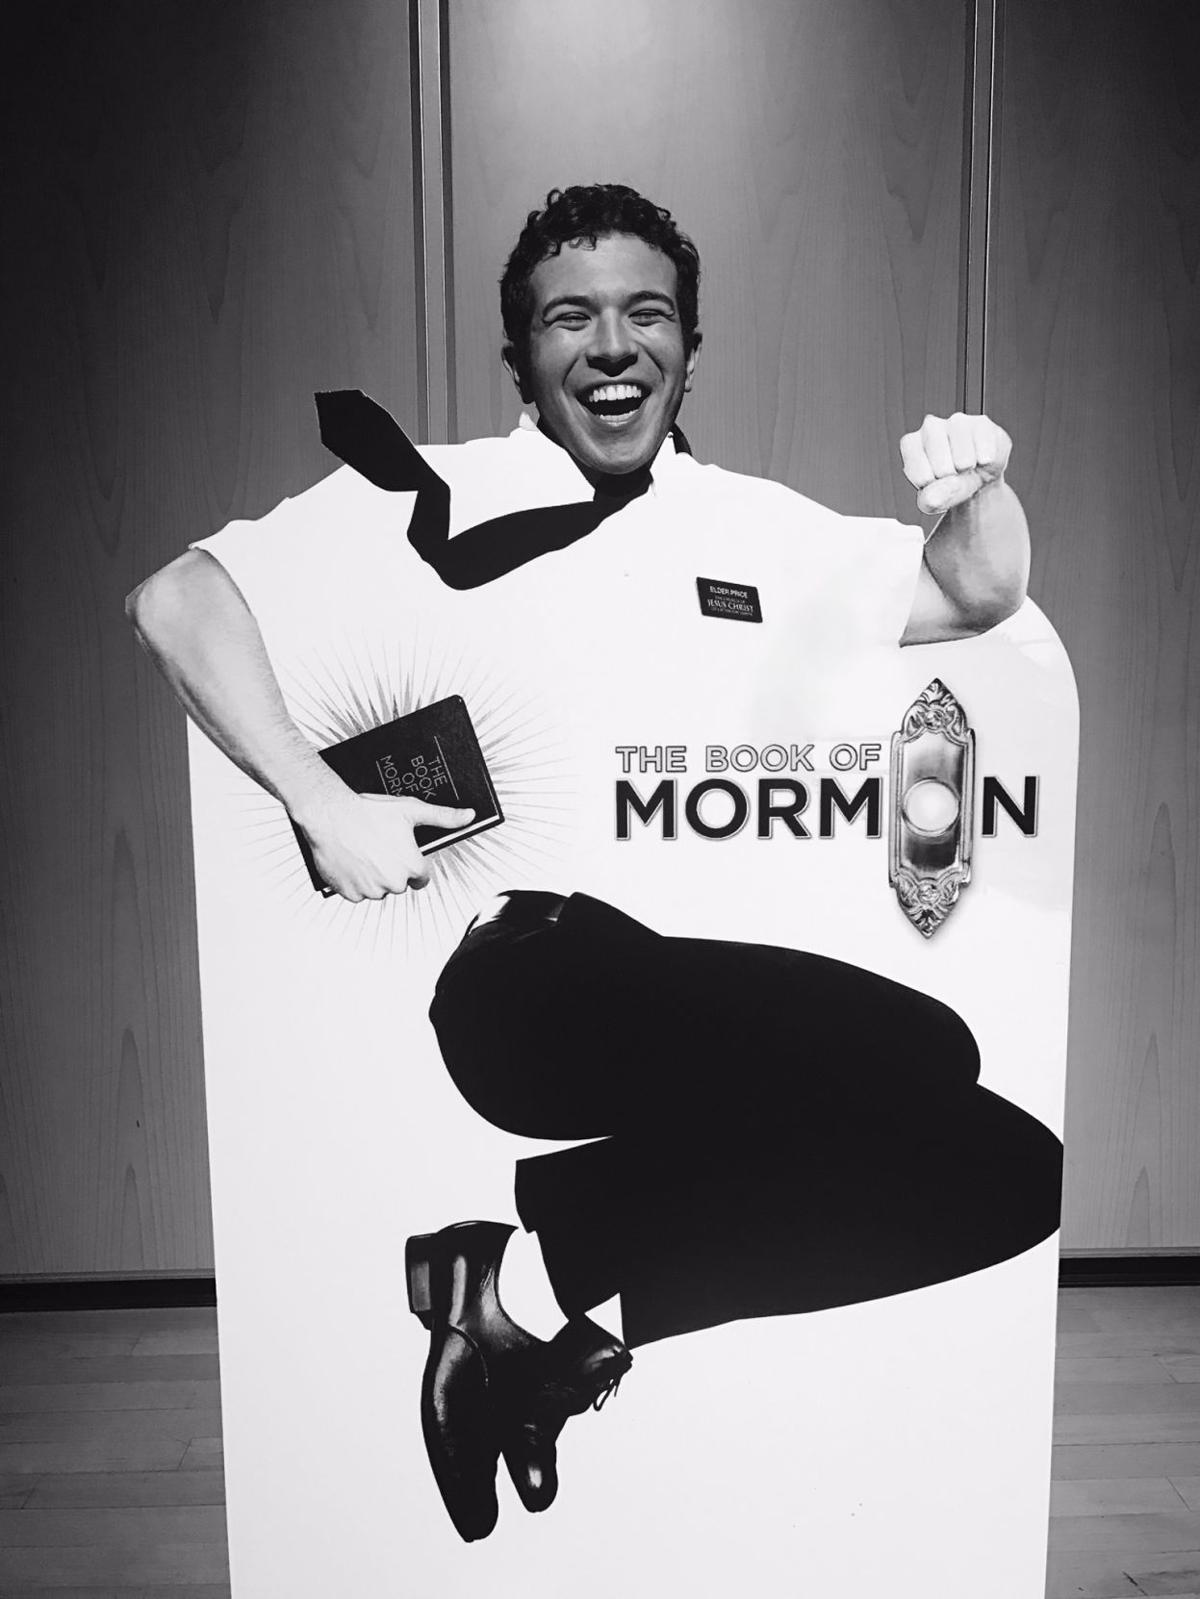 020317_Arts - Brown - Mormon.jpg